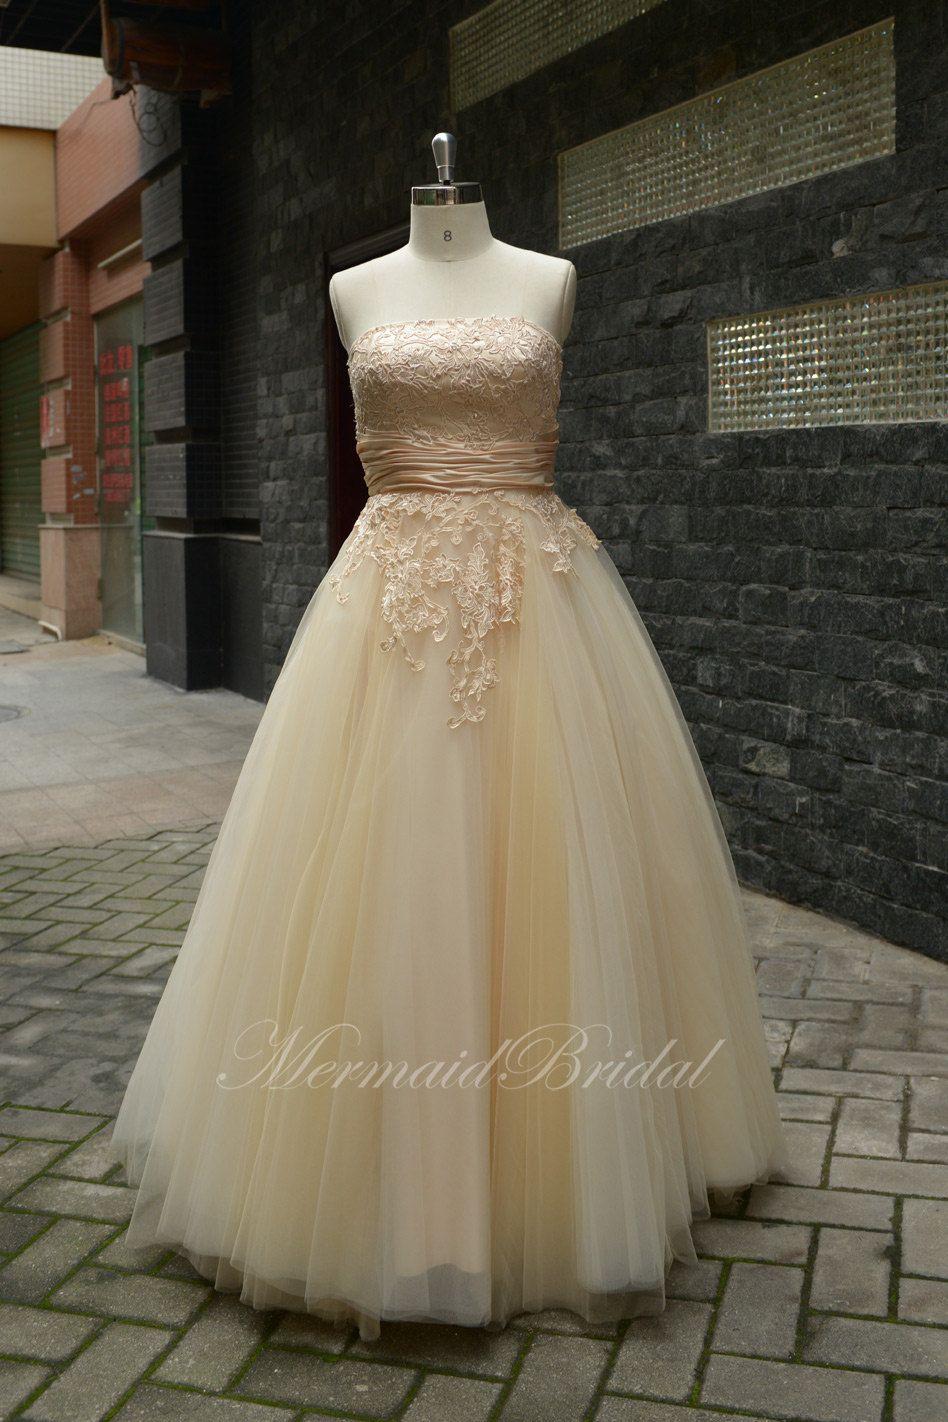 Vintage lace champagne wedding dress   champagne Outdoor Destination wedding dress Vintage lace